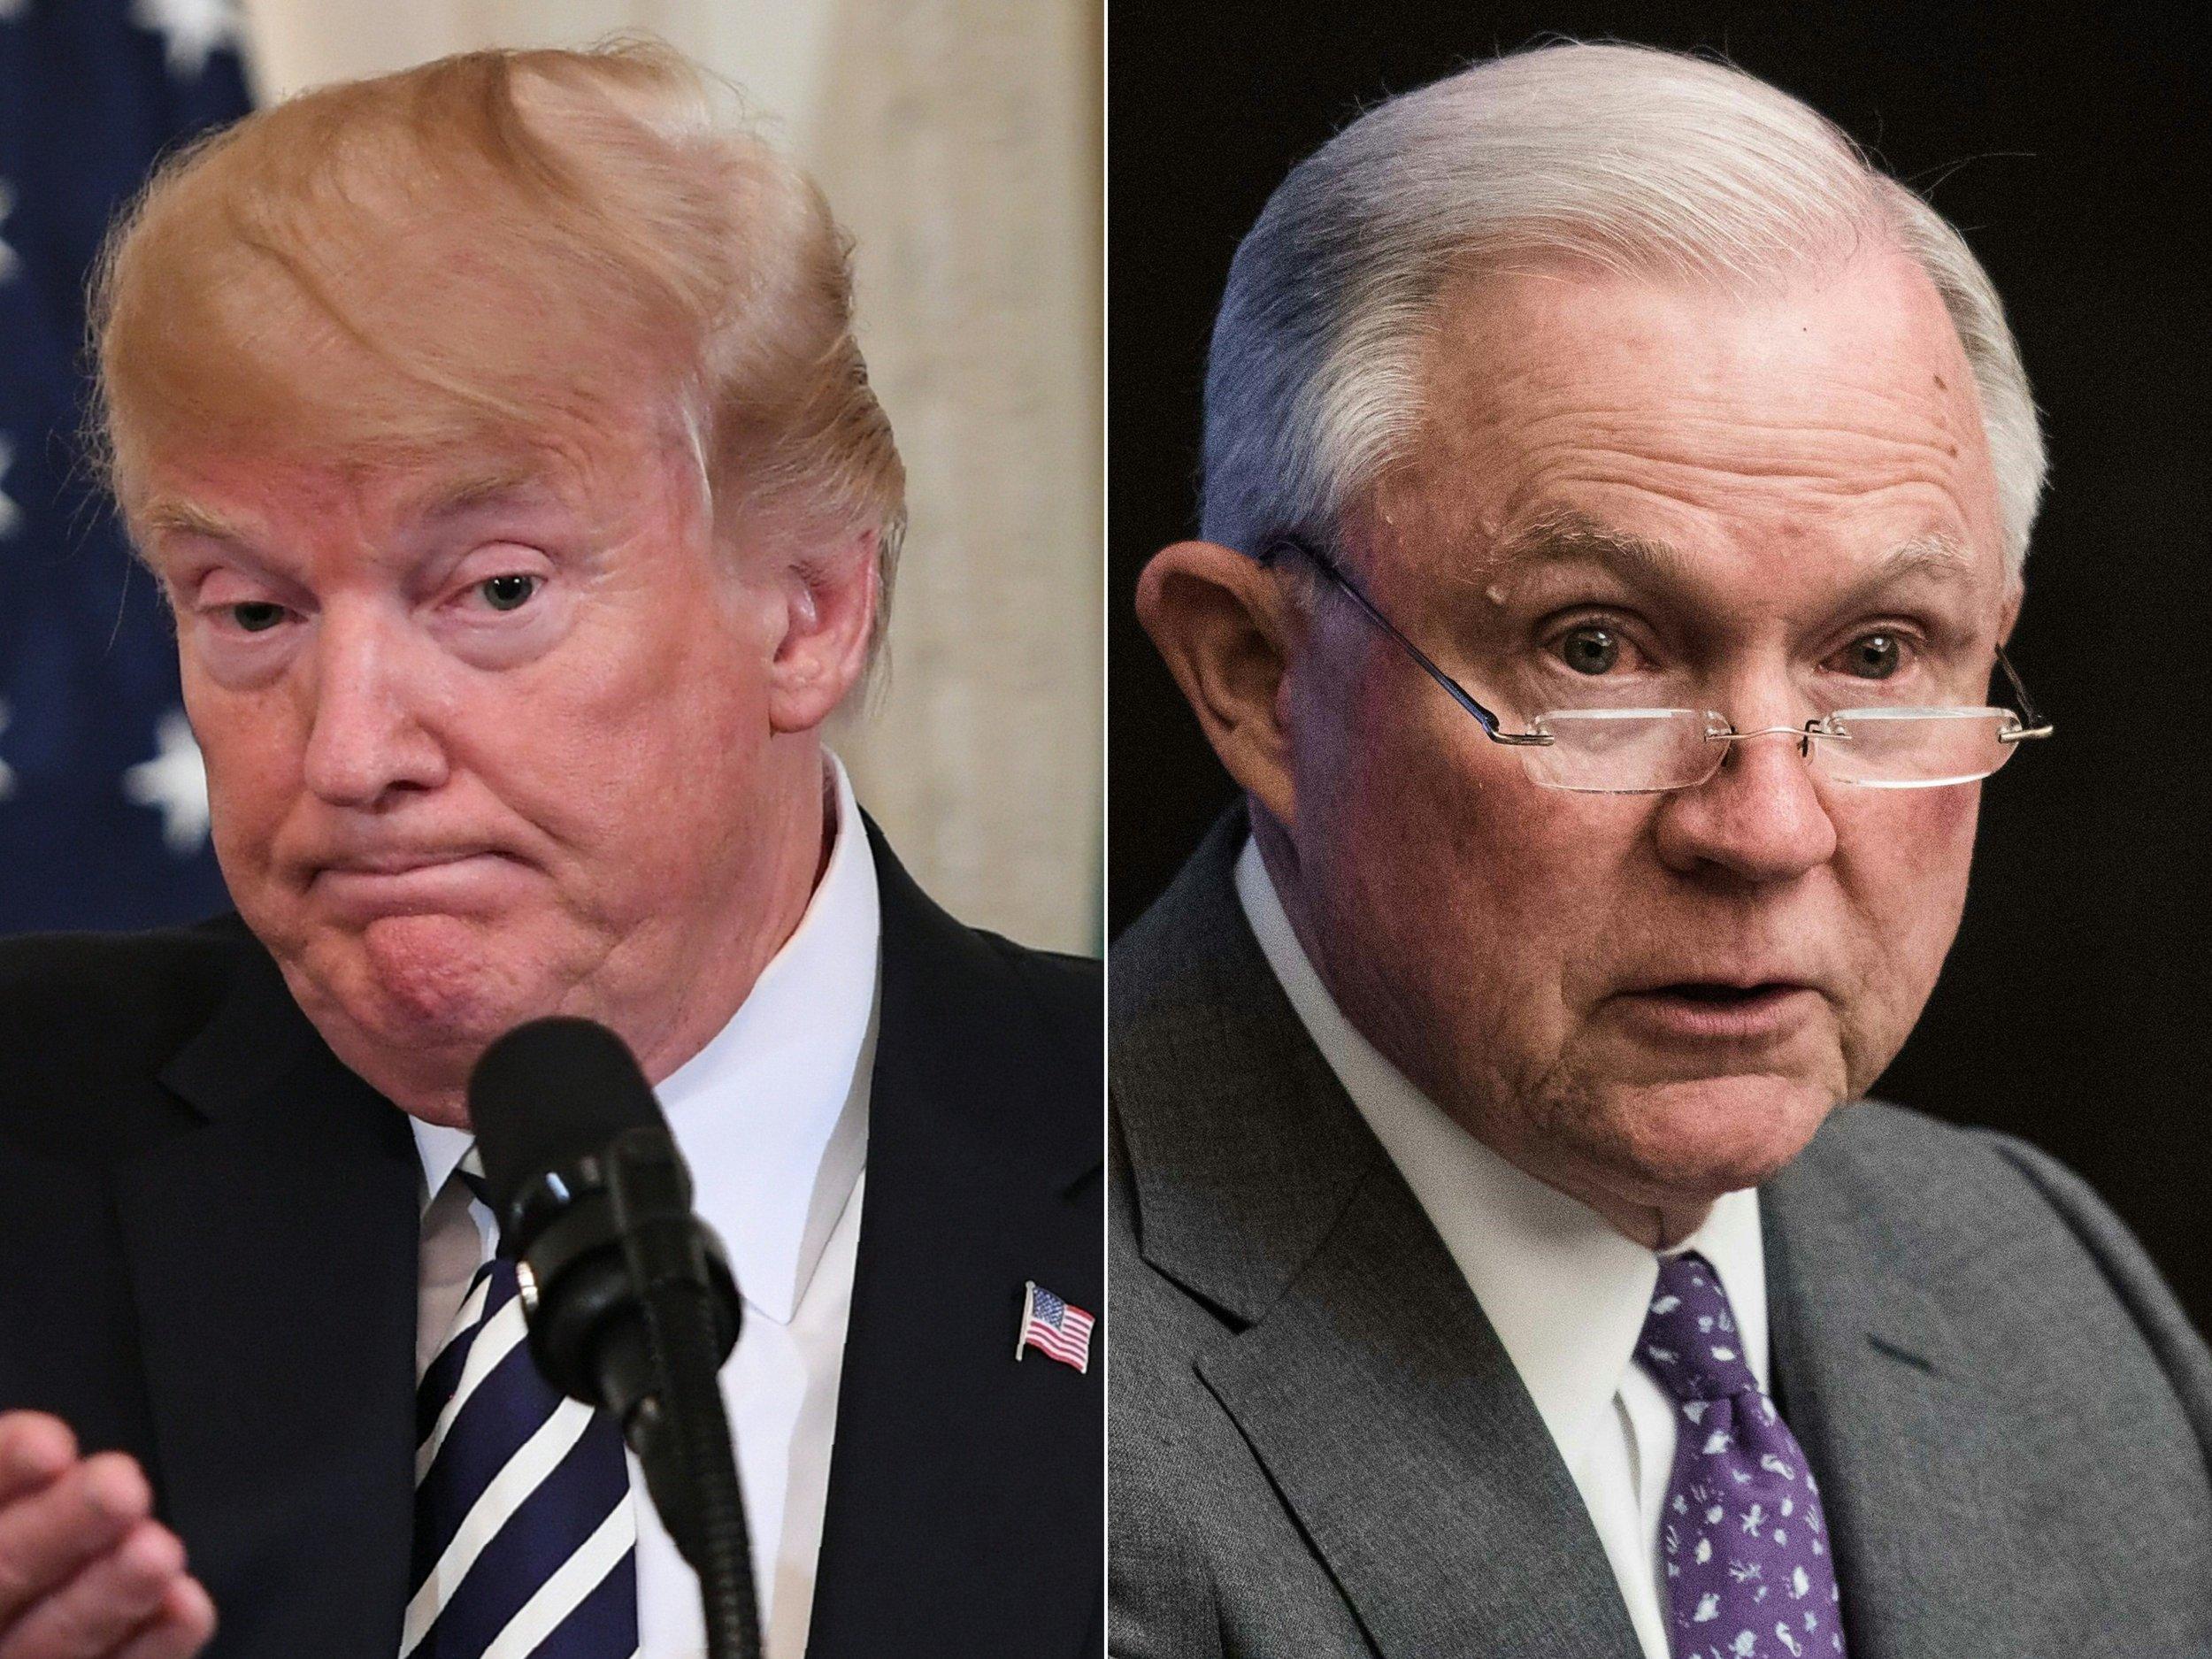 Sessions/Trump